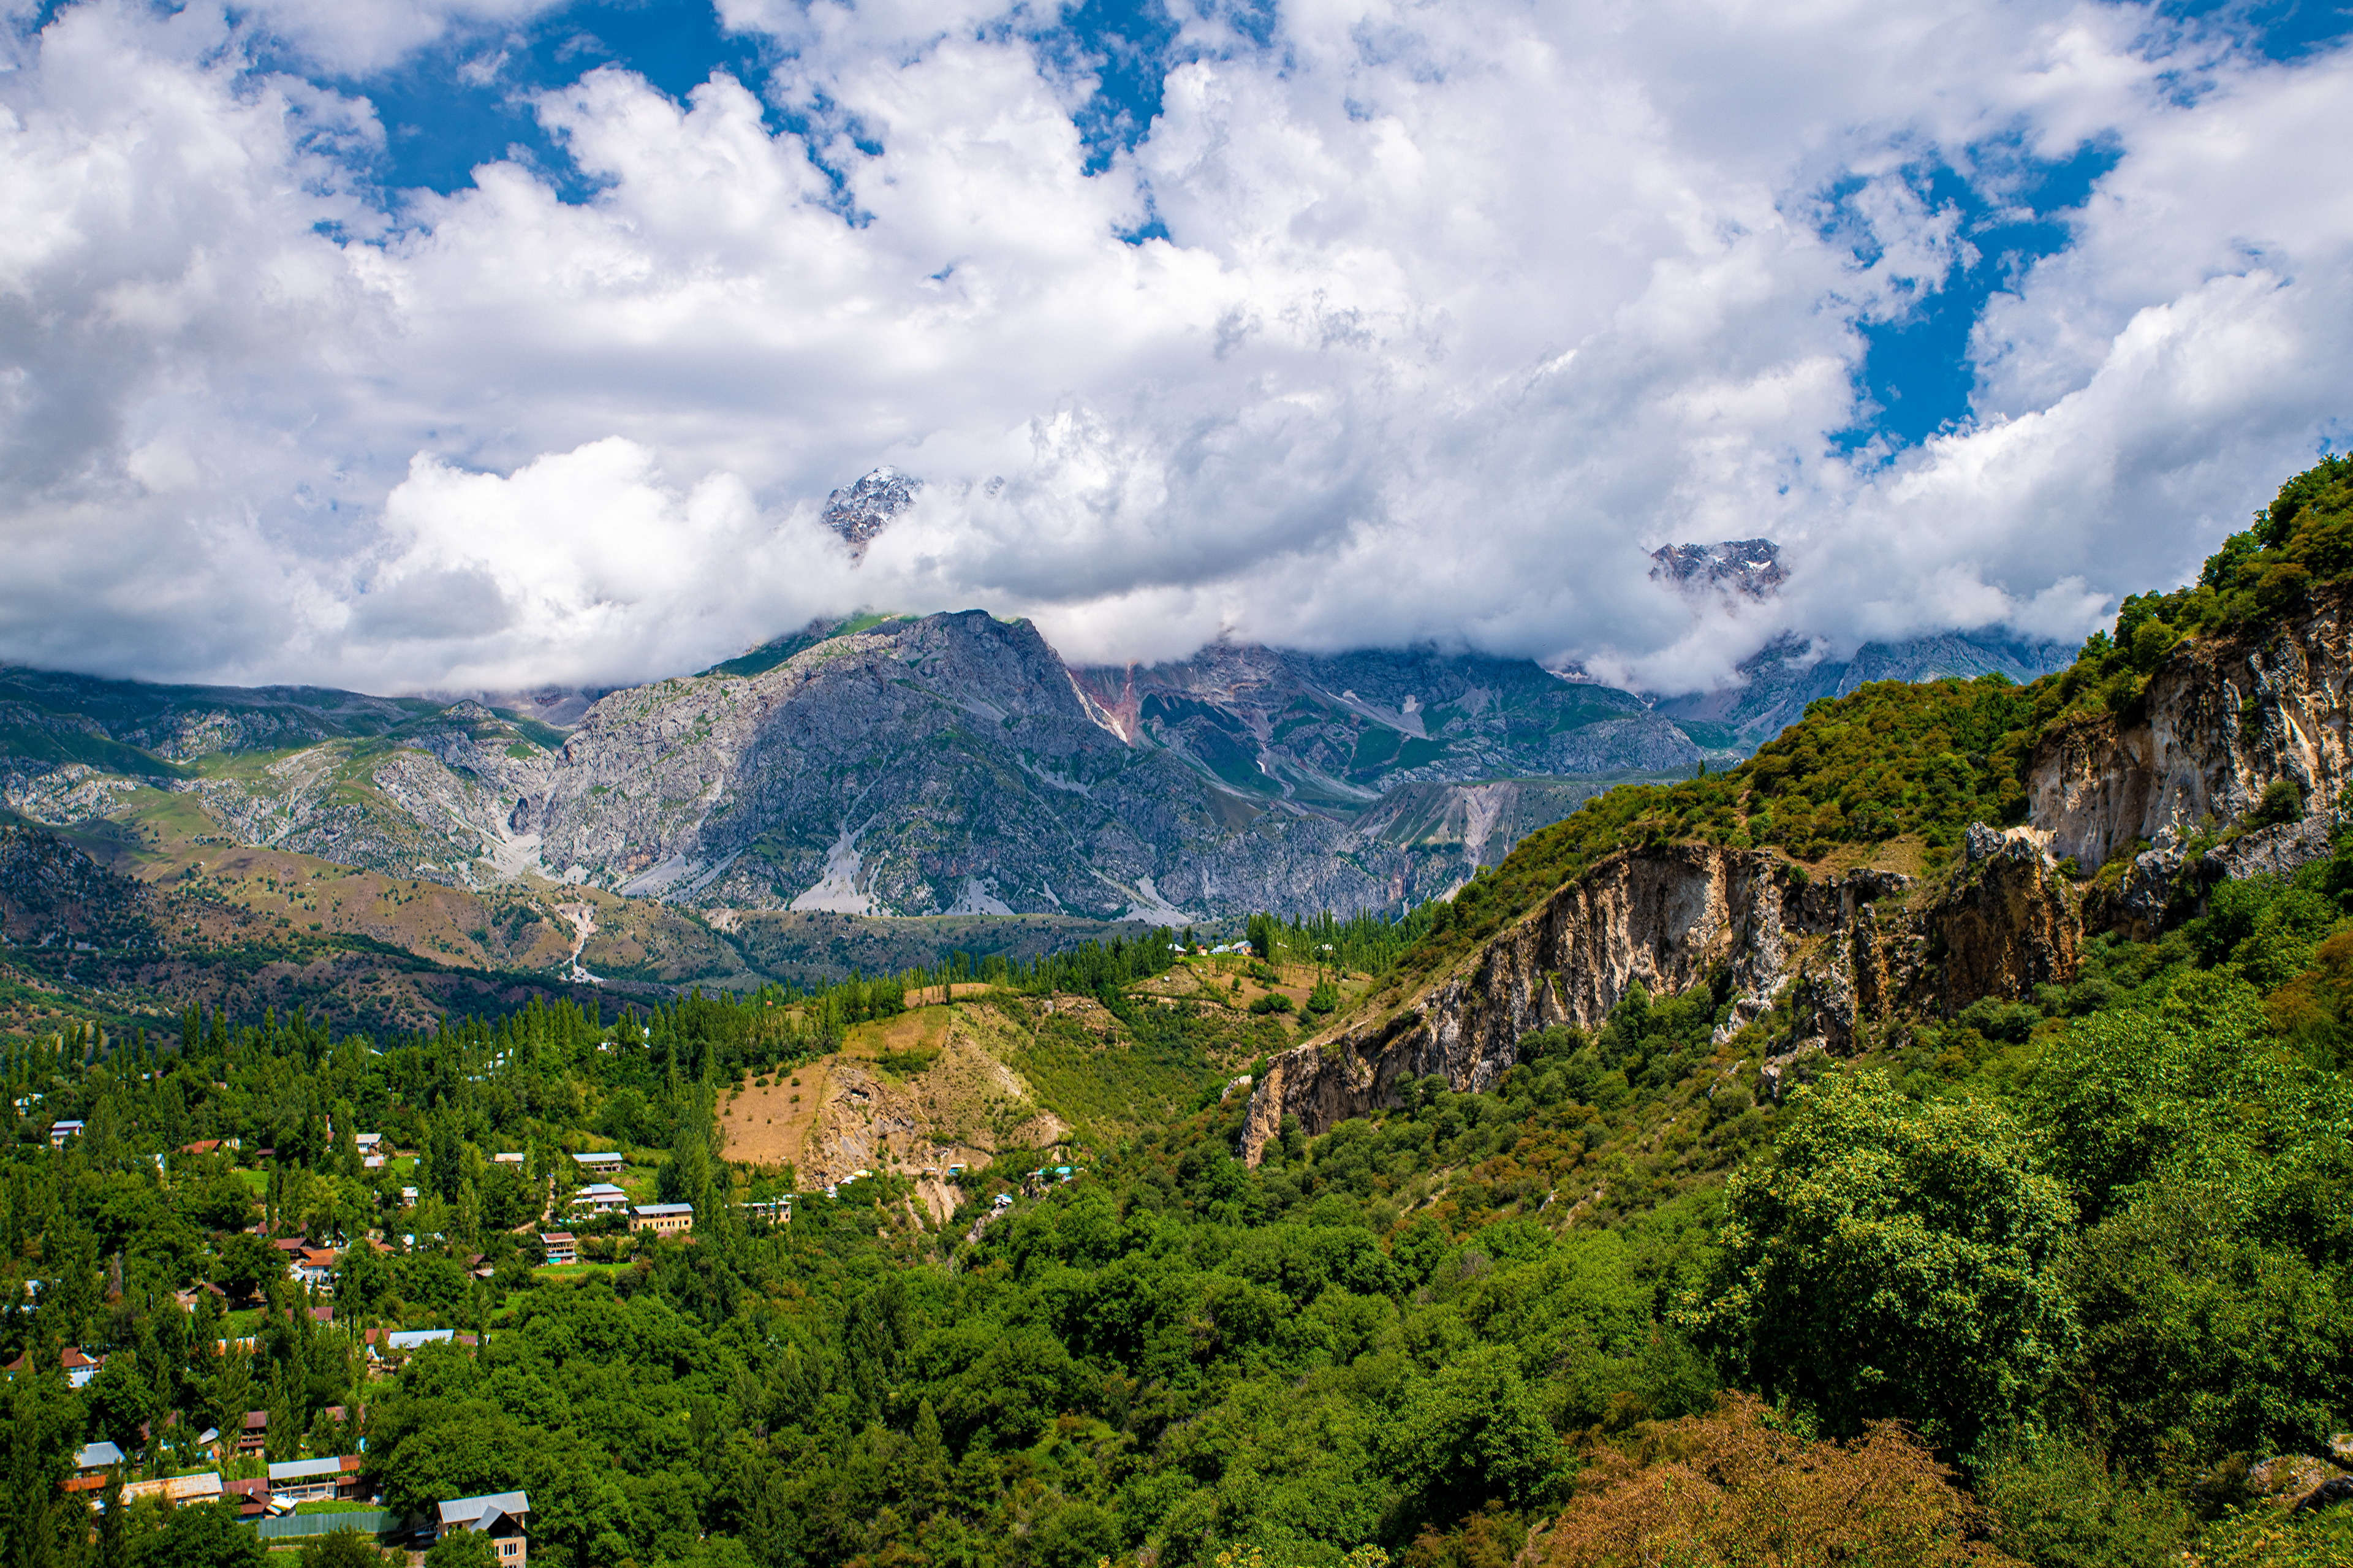 Fotos Arslanbob, Kyrgyzstan Natur Gebirge Wolke 3840x2560 Berg